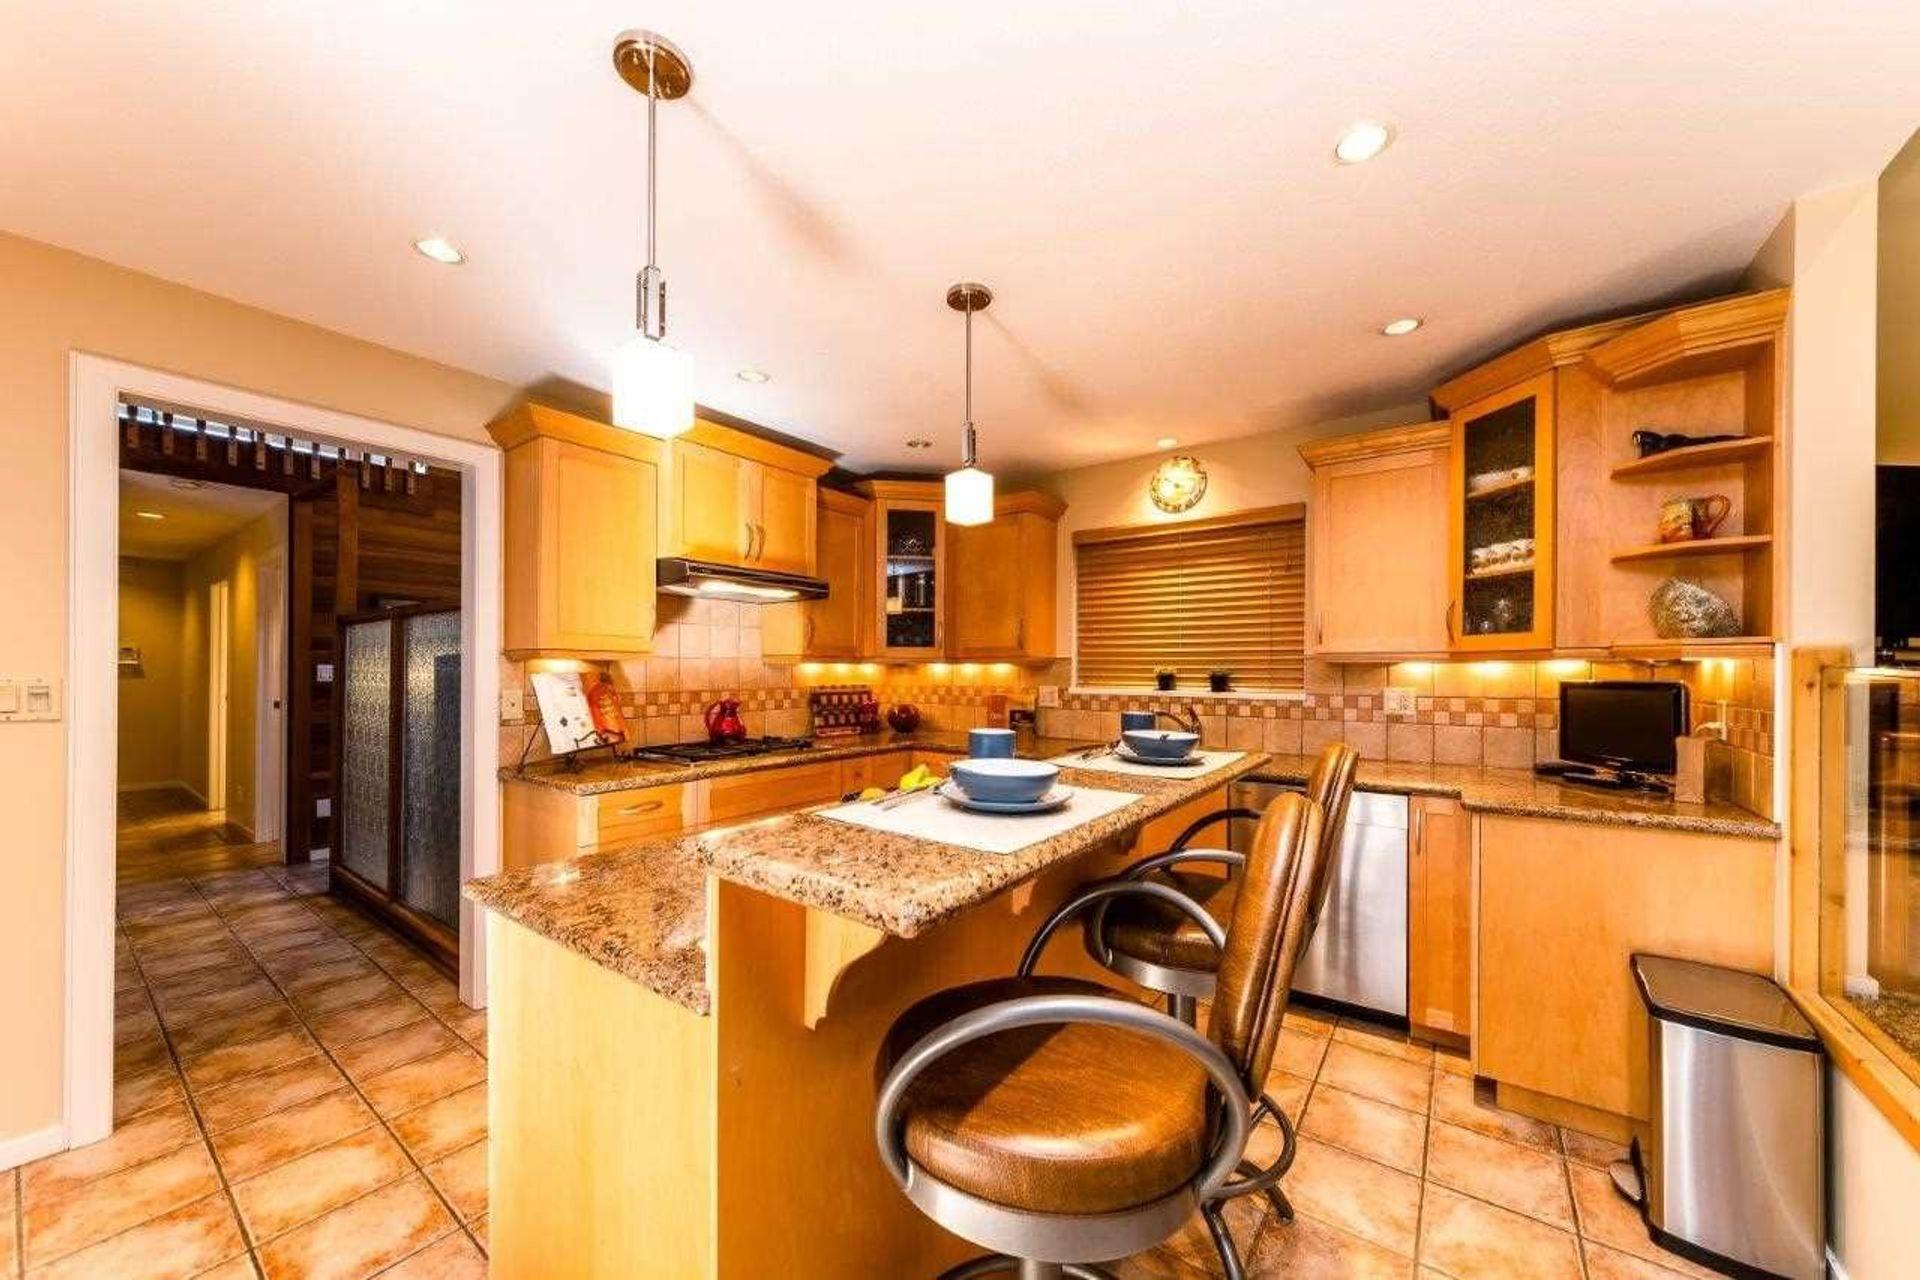 3760-st-pauls-avenue-upper-lonsdale-north-vancouver-11 at 3760 St. Pauls Avenue, Upper Lonsdale, North Vancouver